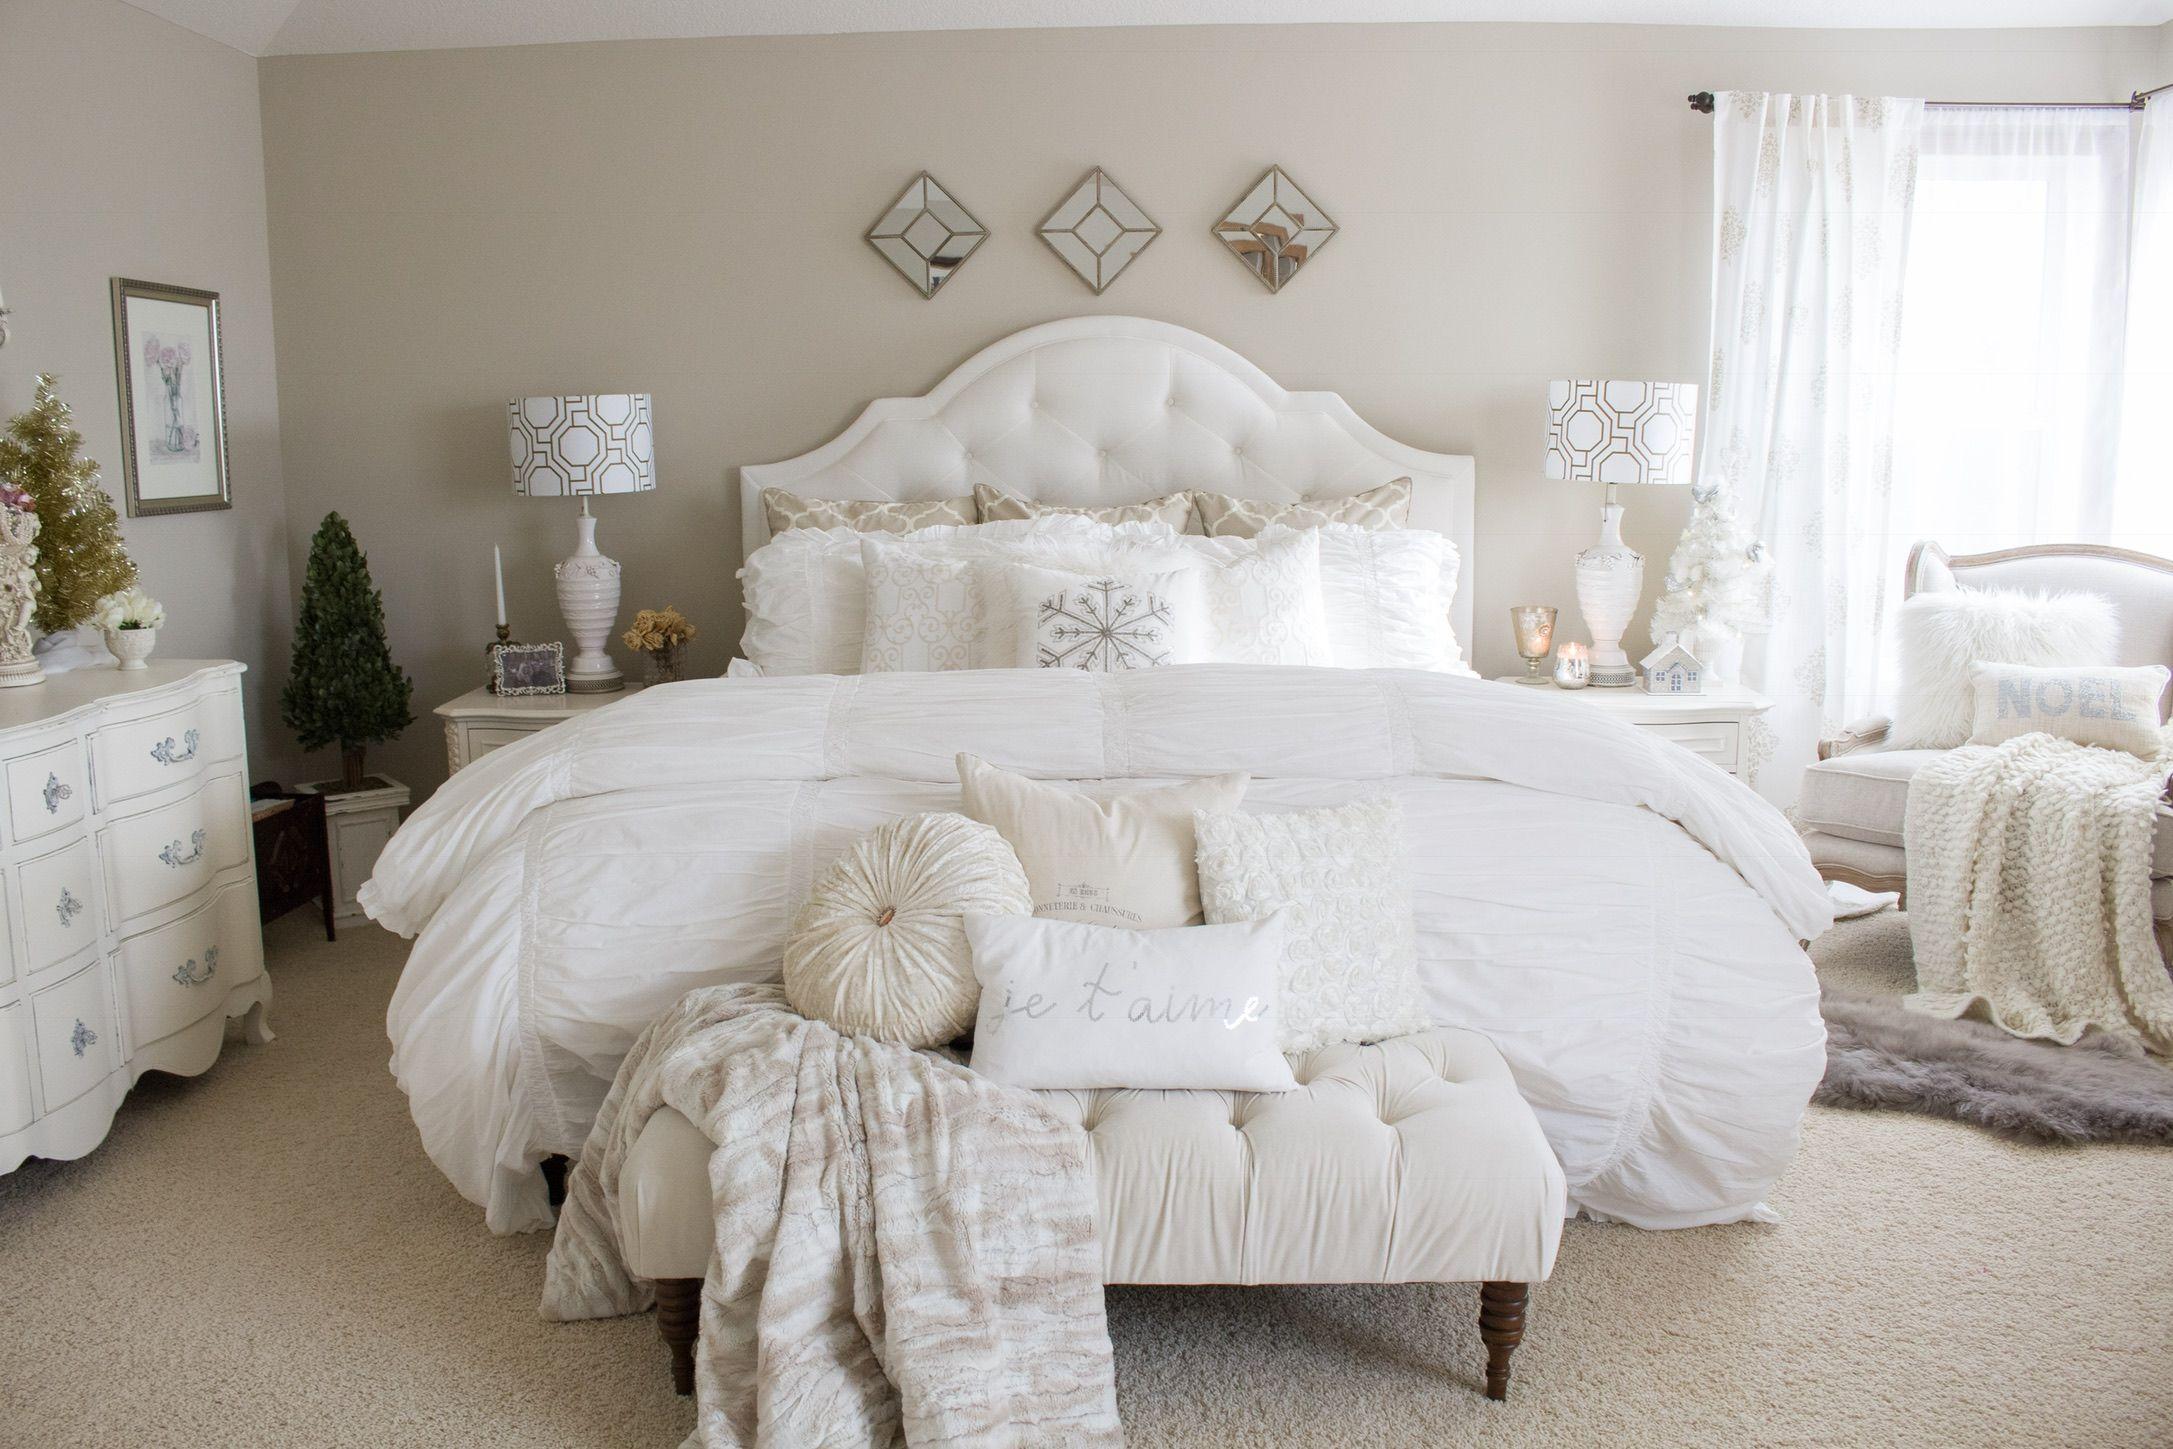 french vintage glam bedroom bloggers best christmas decor recipes rh pinterest com Romantic Luxury Master Bedroom vintage glam bedroom home depot